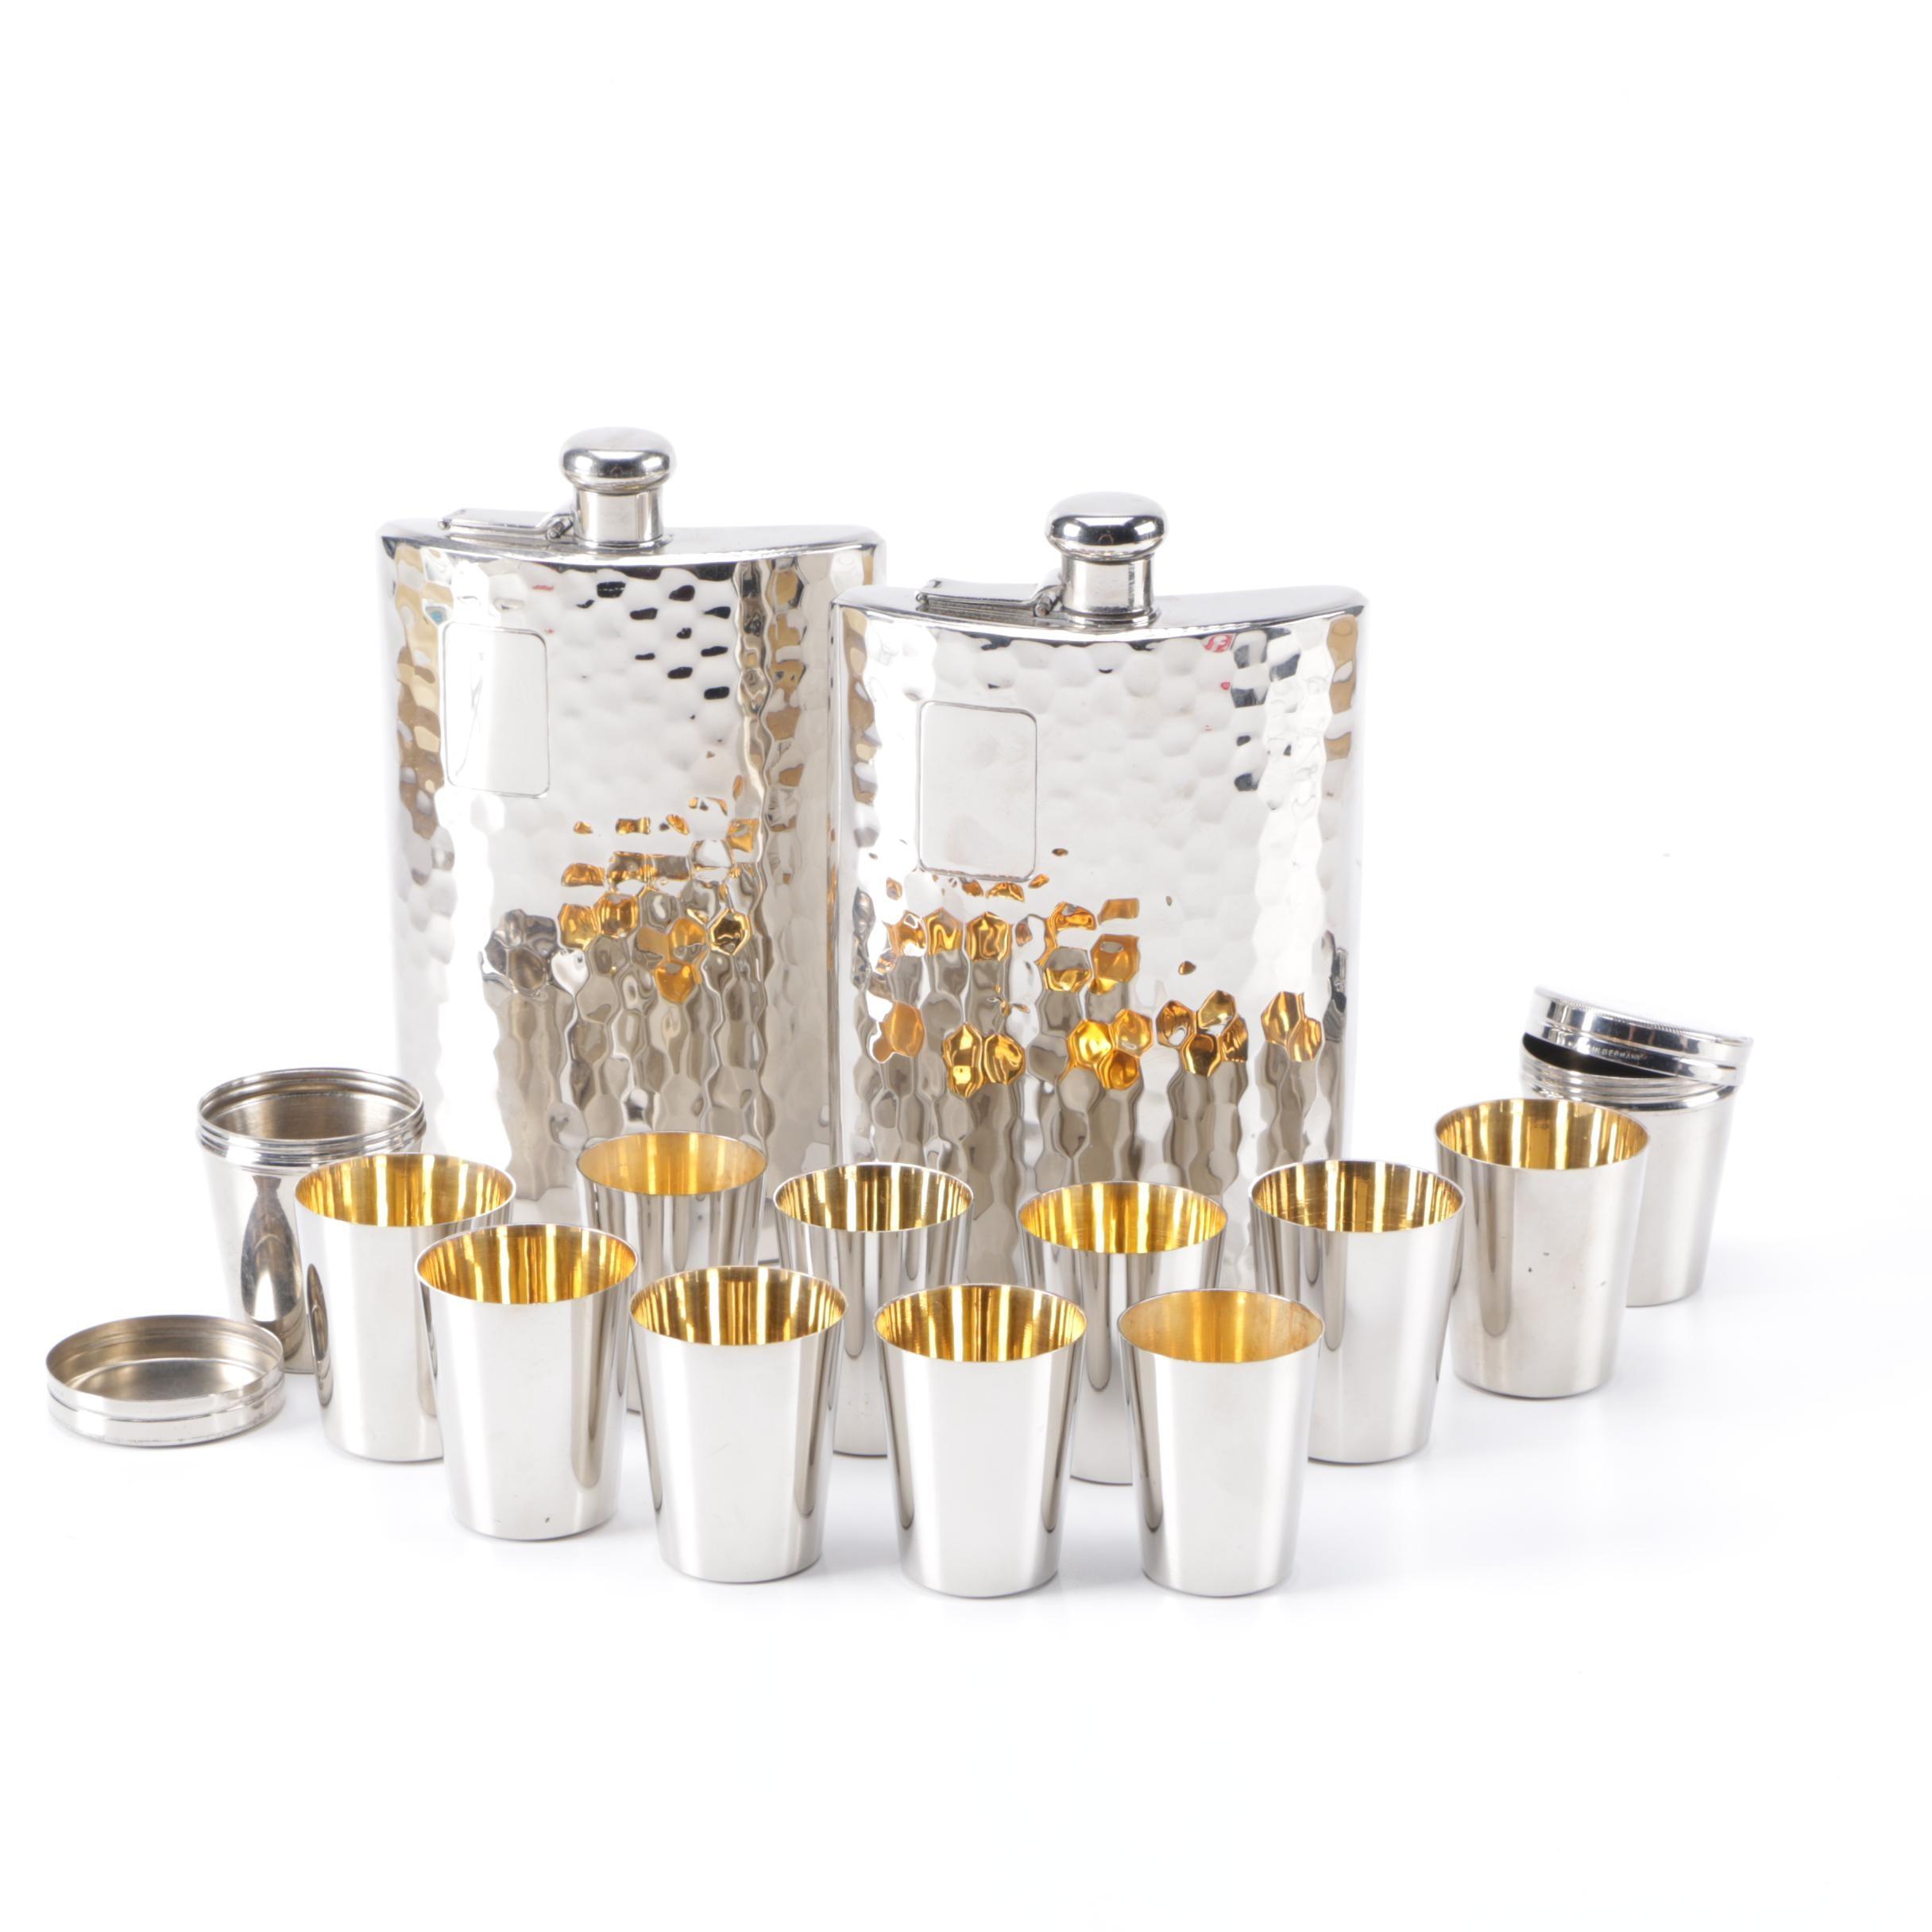 German Flasks and Shot Glasses